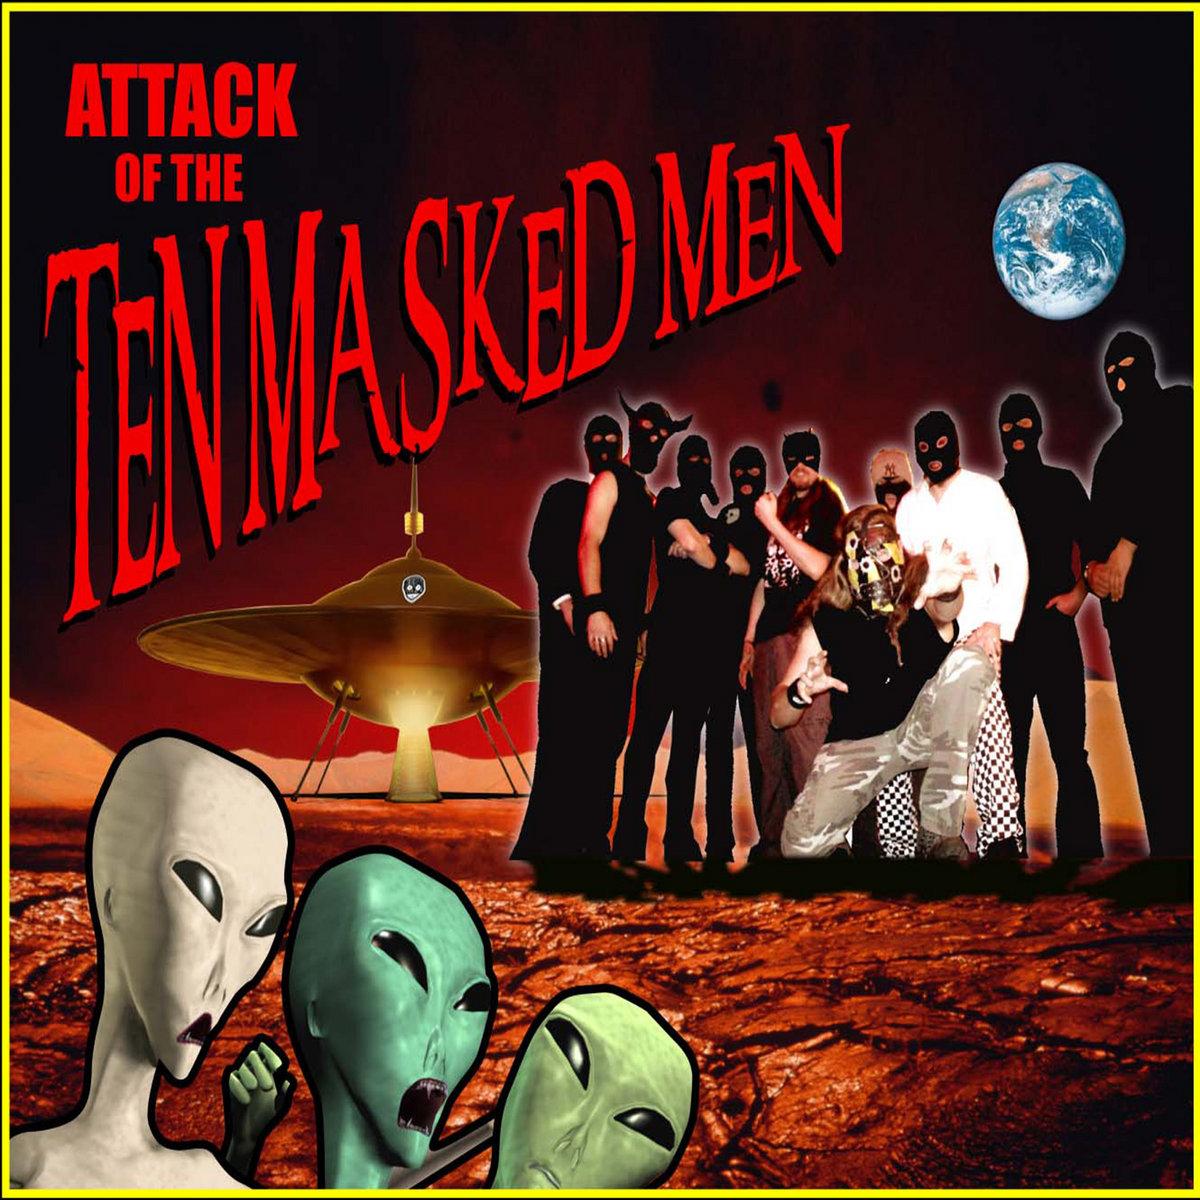 Ten Masked Men Return Of The Ten Masked Men 91